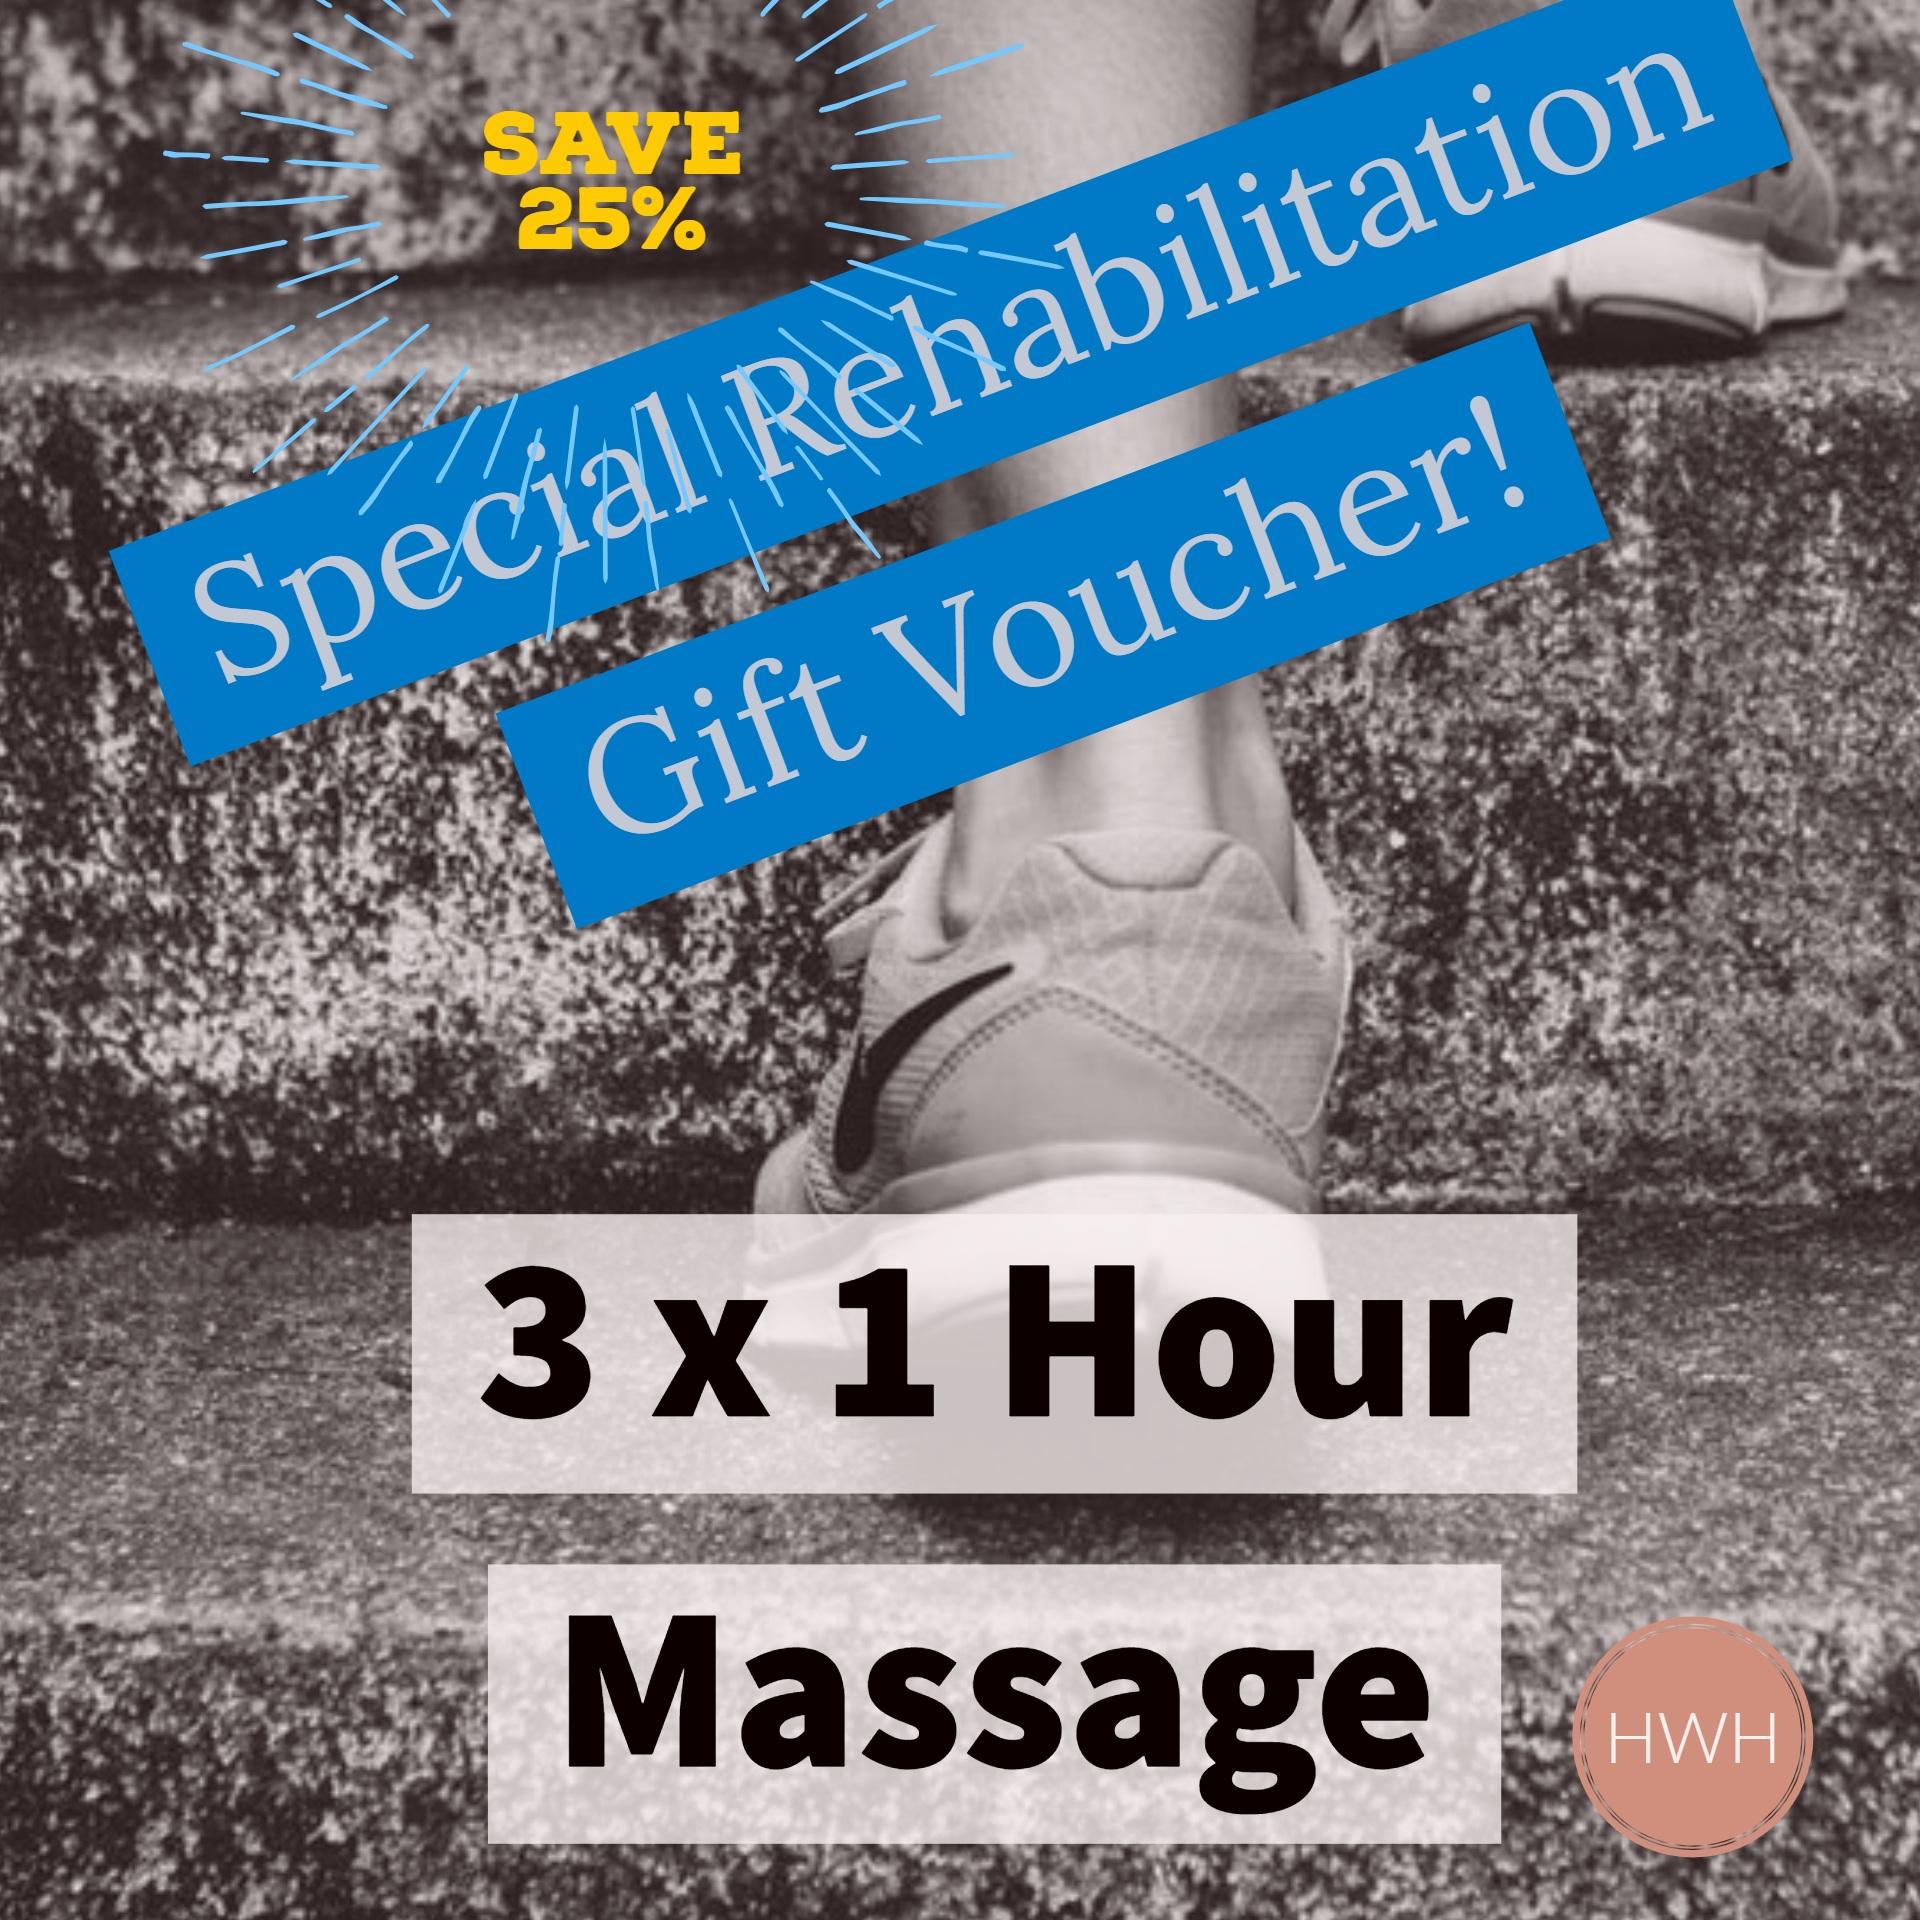 Massage+package+offer